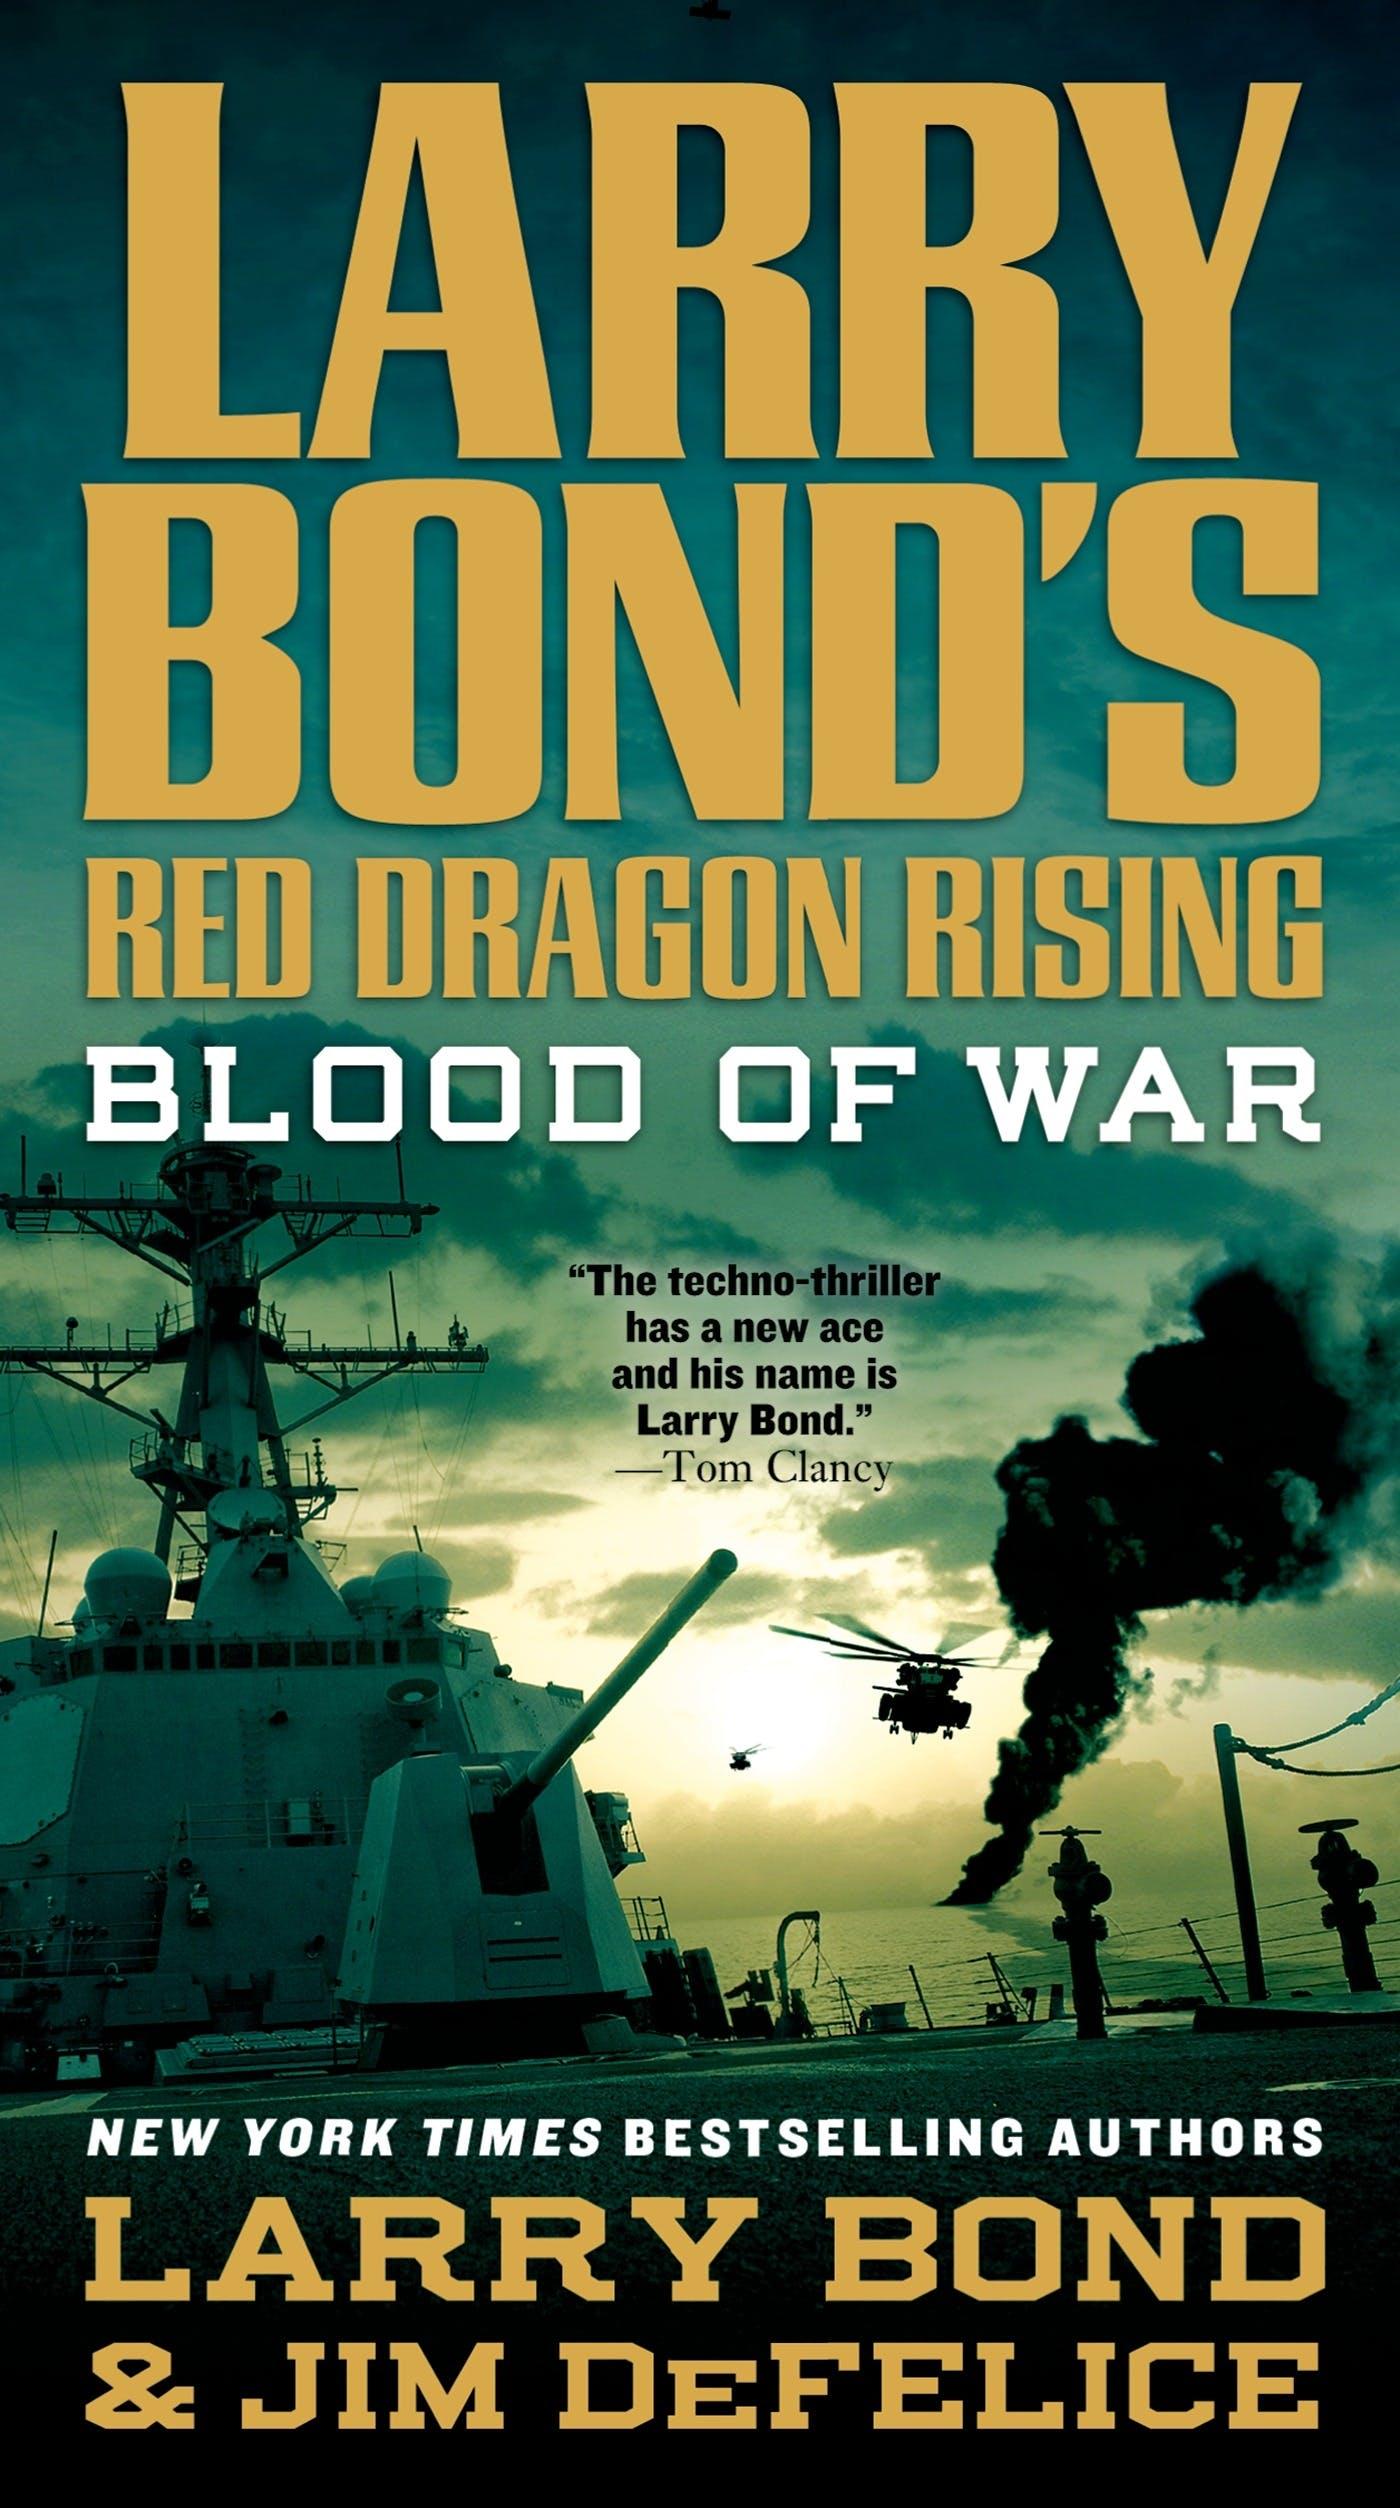 Image of Larry Bond's Red Dragon Rising: Blood of War